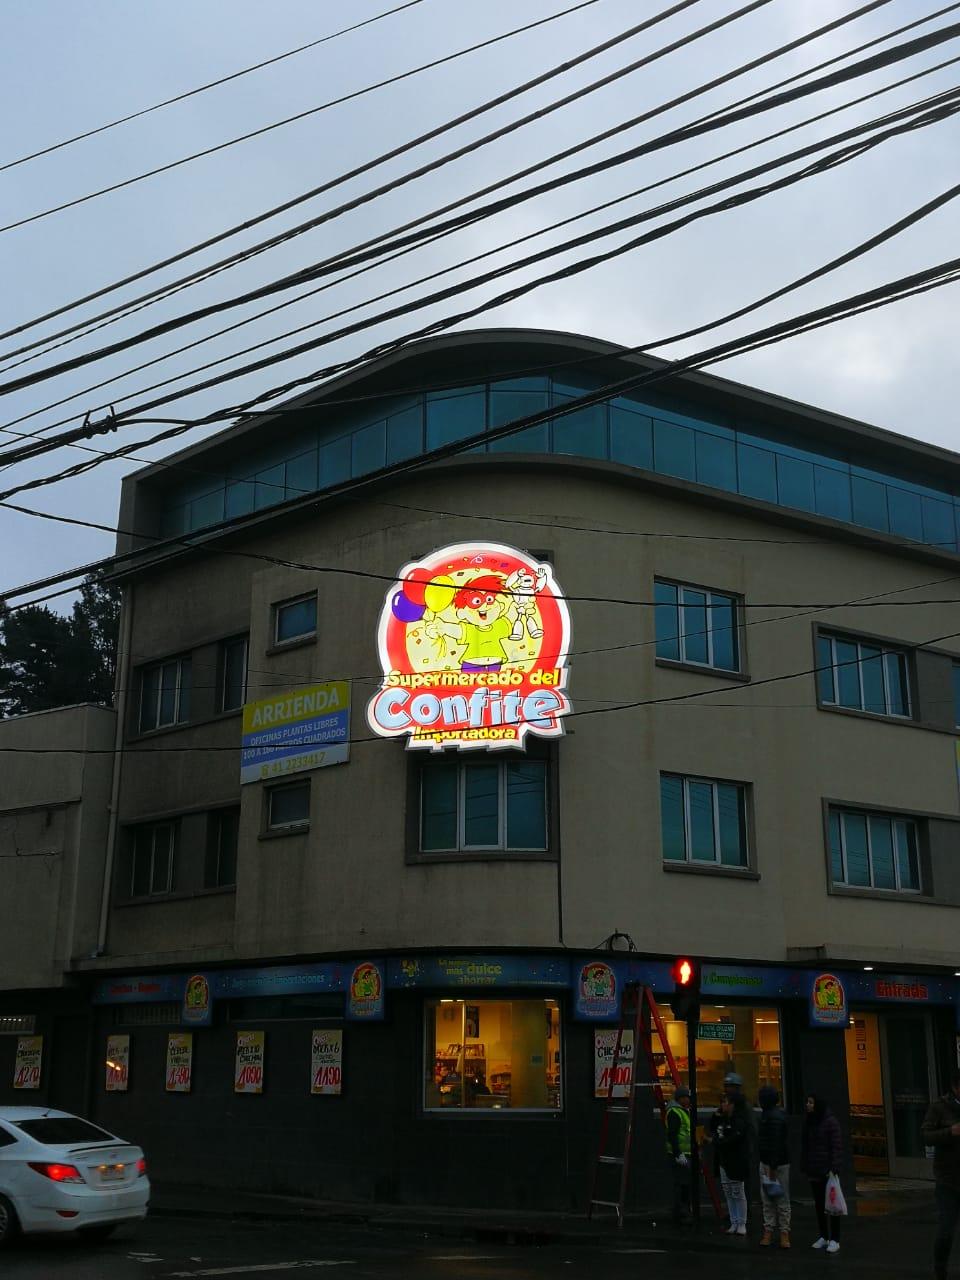 DPImpress - Letreros Luminosos Supermercado del Confite Concepción